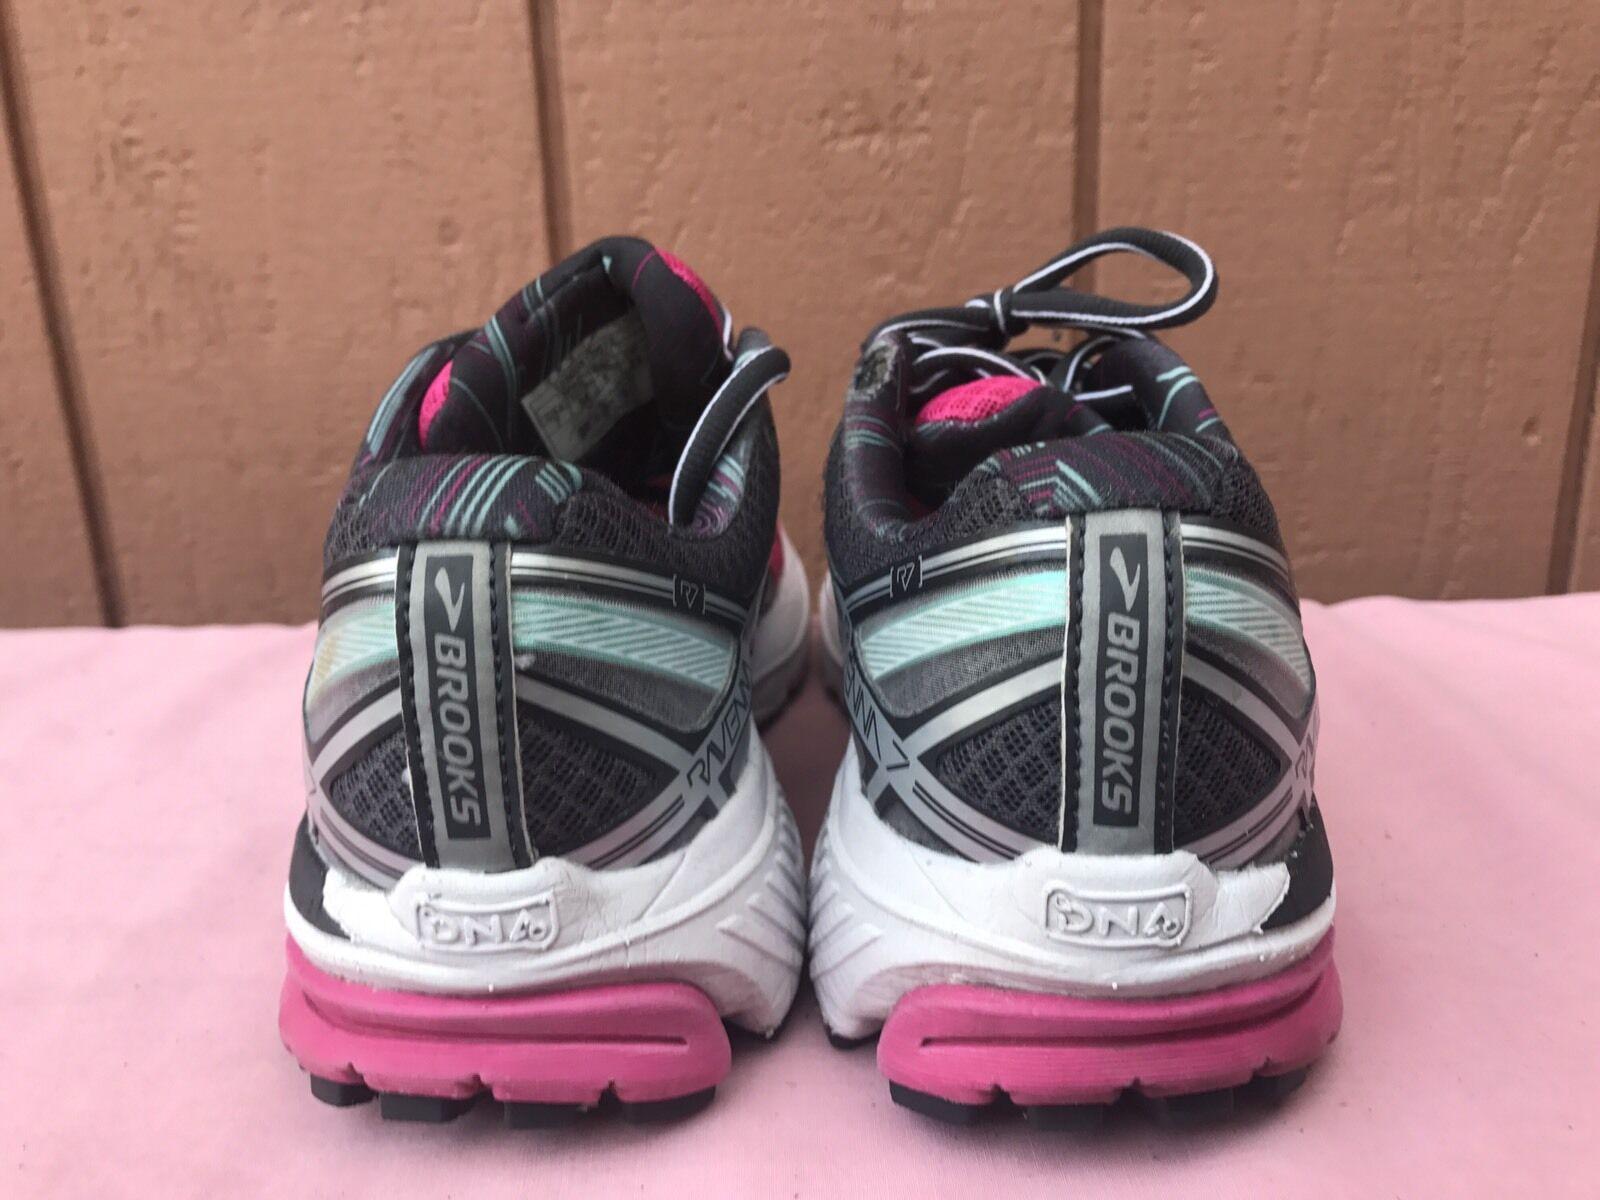 EUC BROOKS 7B WOMEN'S RAVENNA 7 US 7B BROOKS EUR 38 FUCHSIA PURPLE RUNNING Schuhe SNEAKERS 704a71